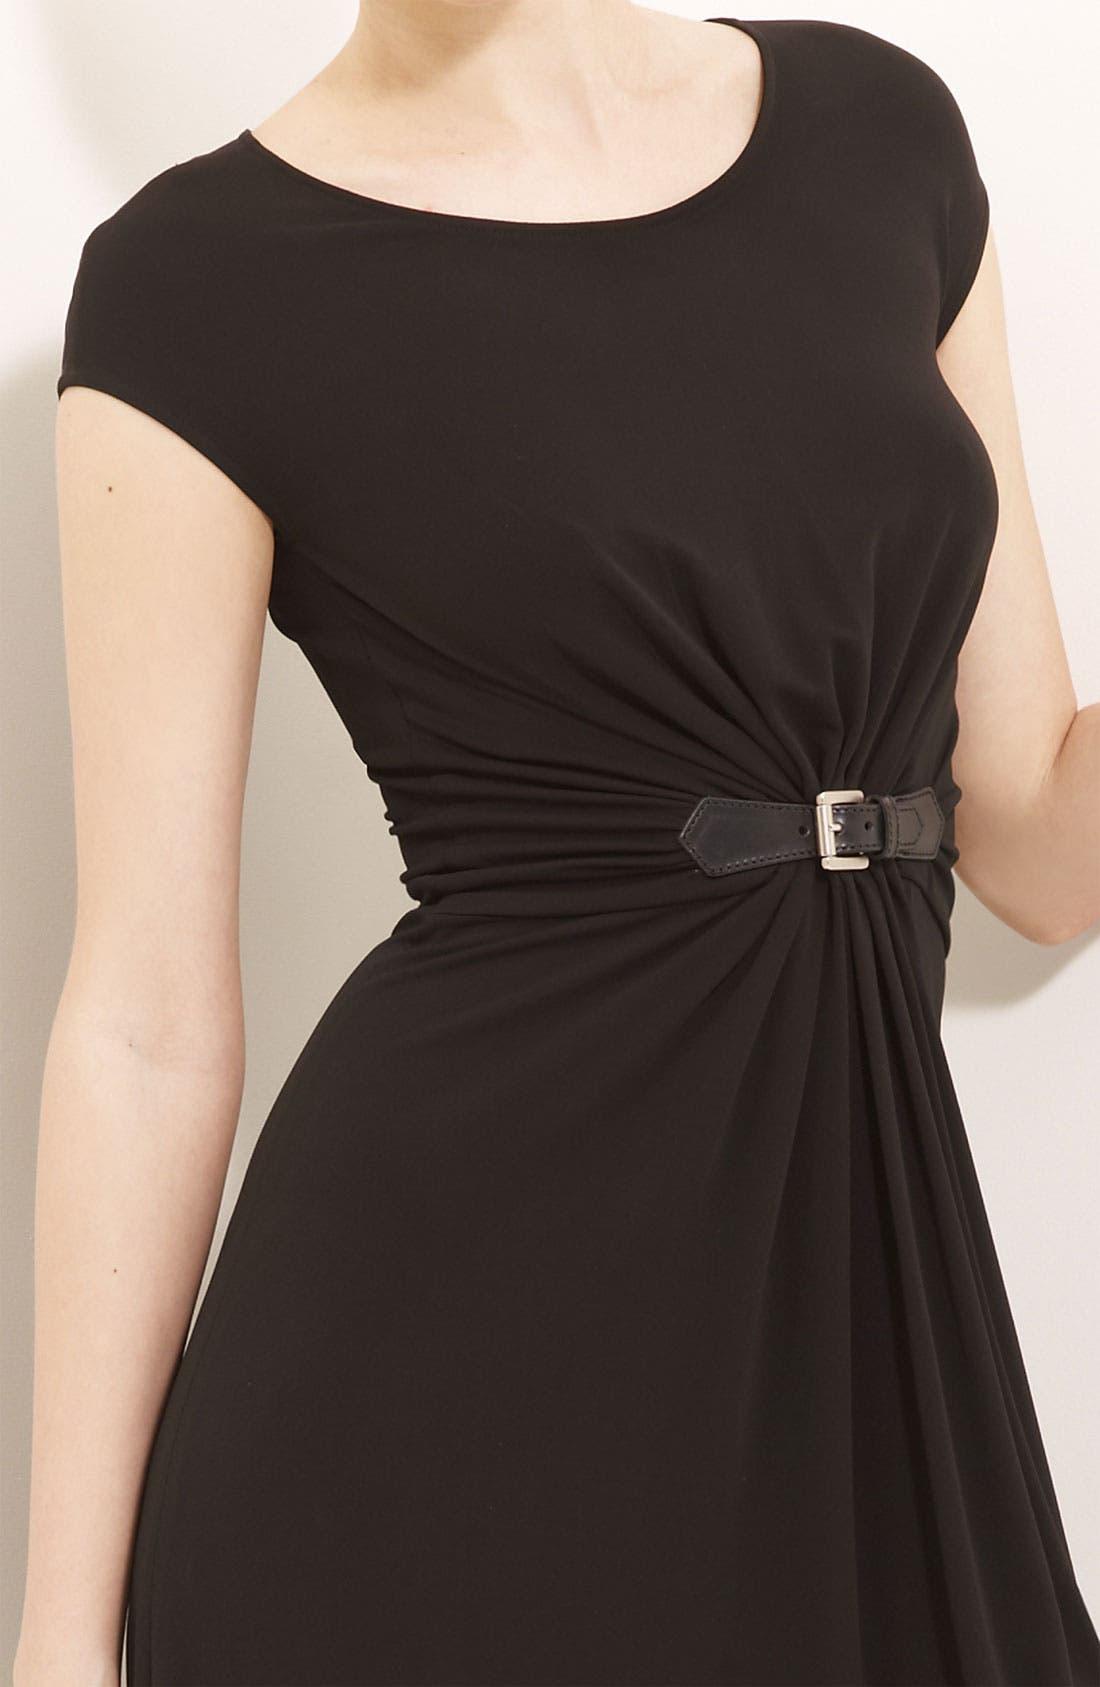 Alternate Image 2  - Michael Kors Gather Front Matte Jersey Dress